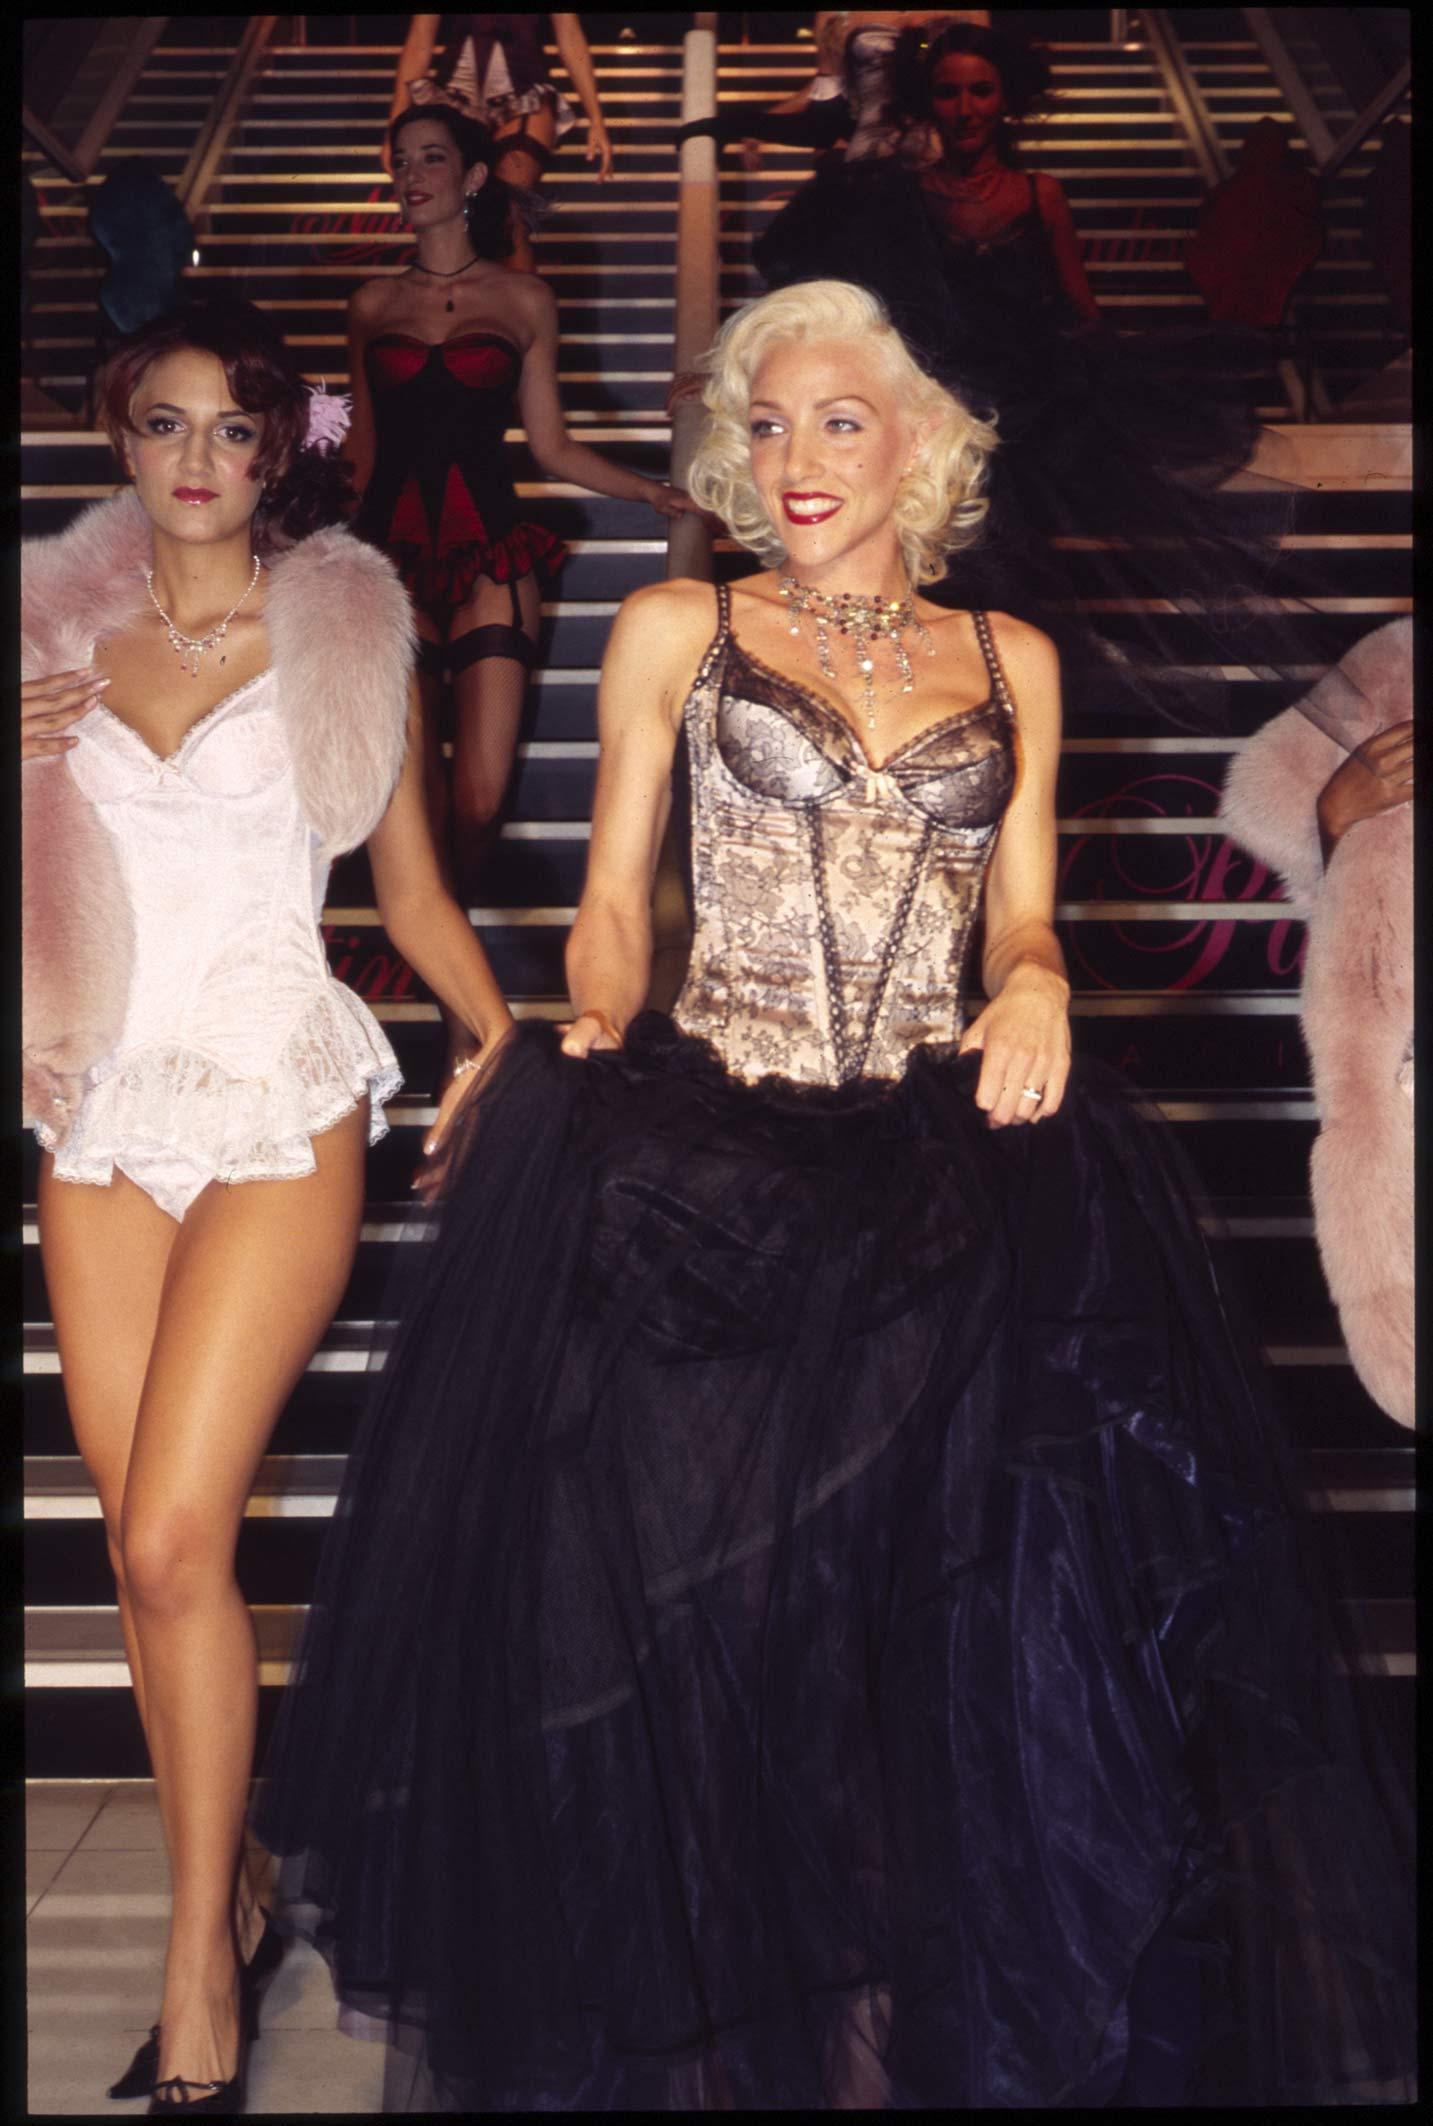 Salon de la lingerie bikini swimwear lingerie corsets for Salon international lingerie